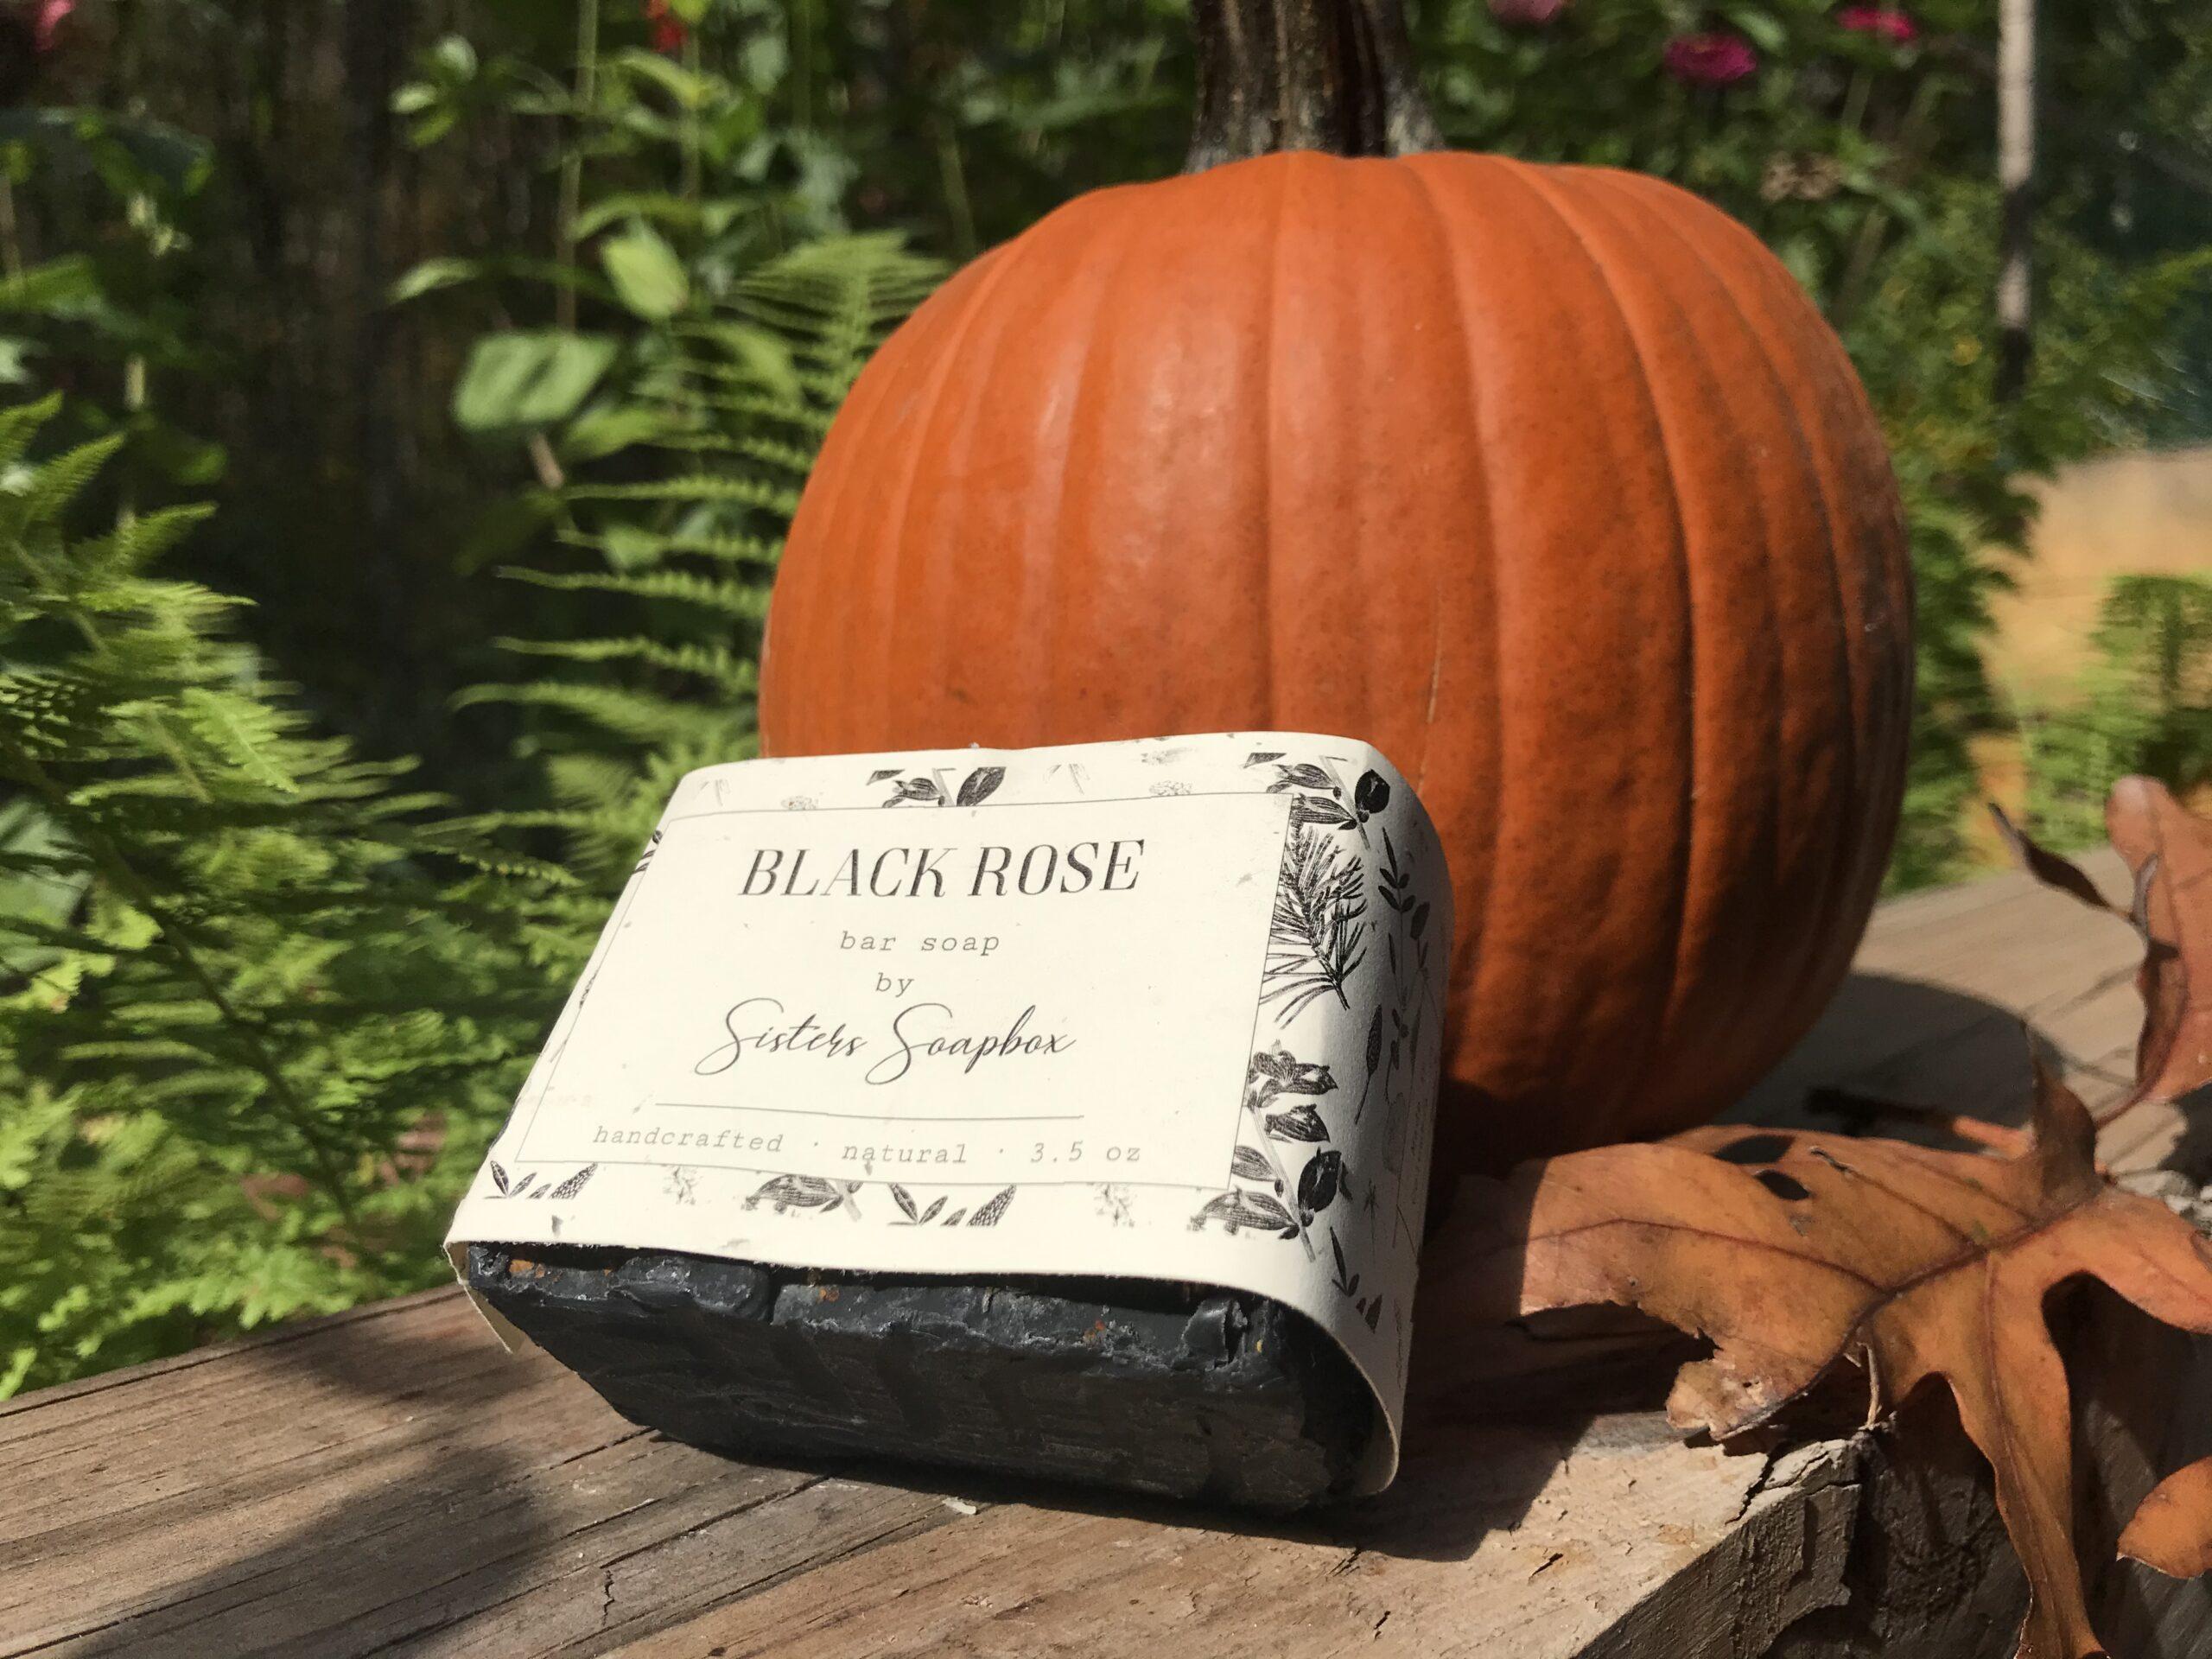 Black Rose soap leaning against a pumpkin